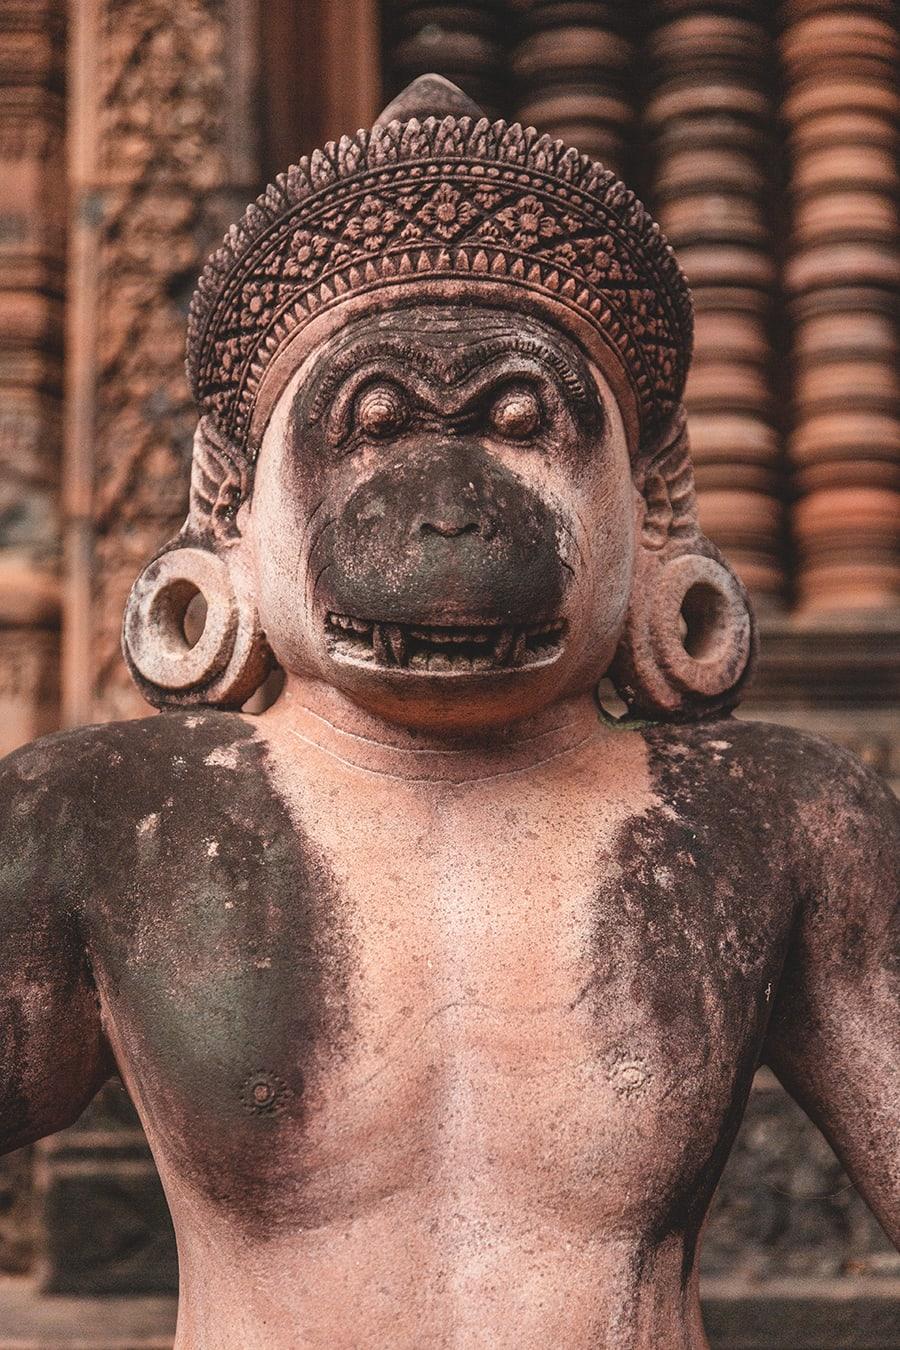 Beautiful 10th century carvings at Banteay Srei, dedicated to the Hindu god Shiva.